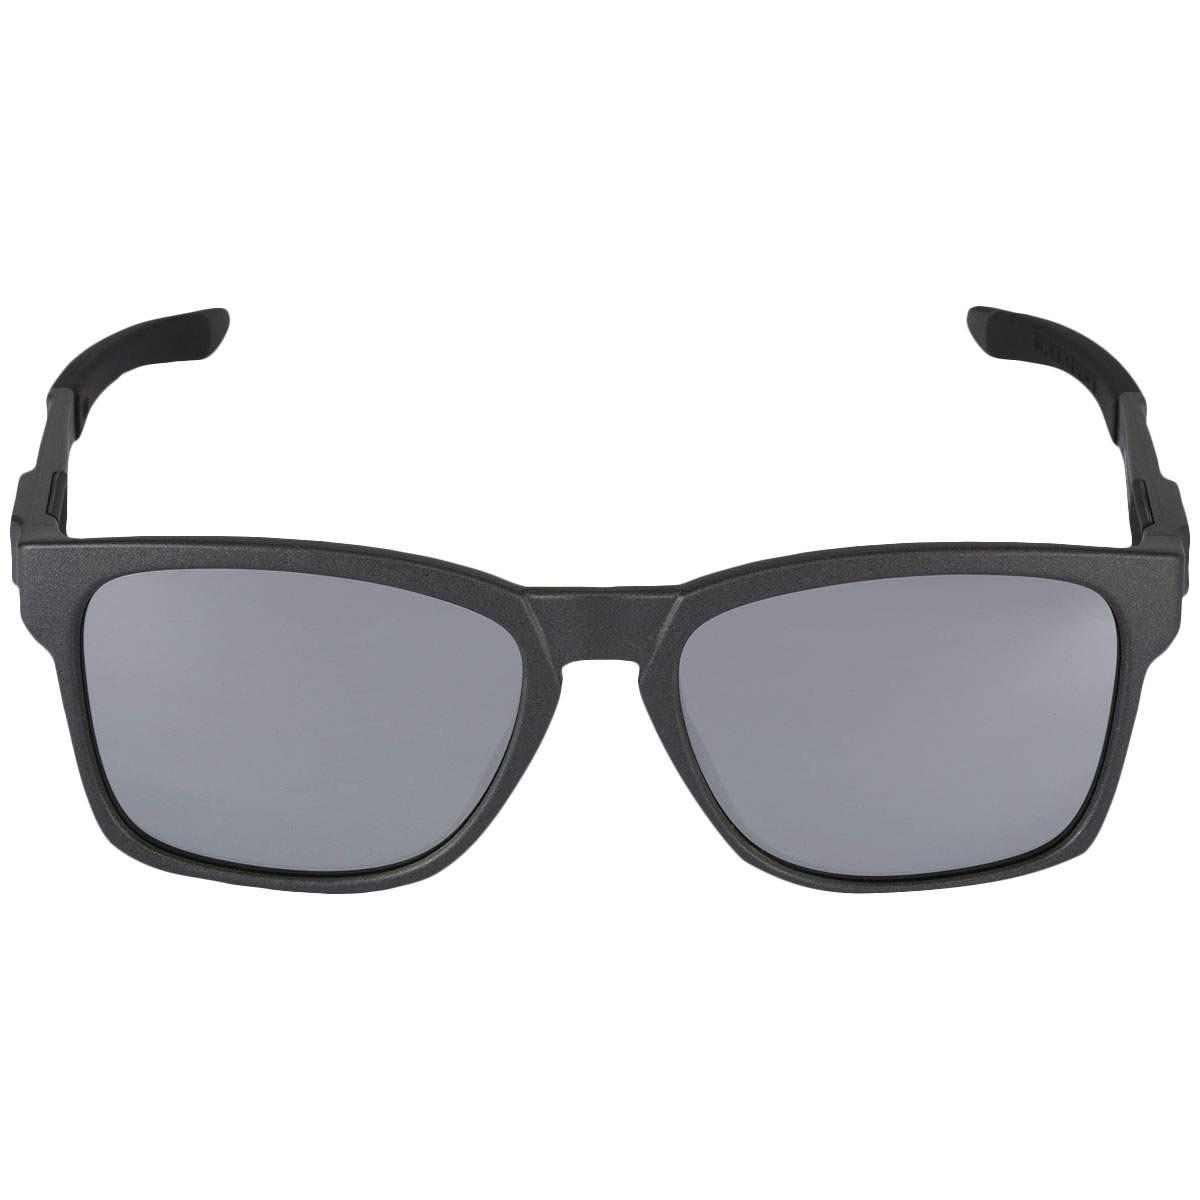 ed6c99099 Óculos Oakley Catalyst Steel Chrome Iridium